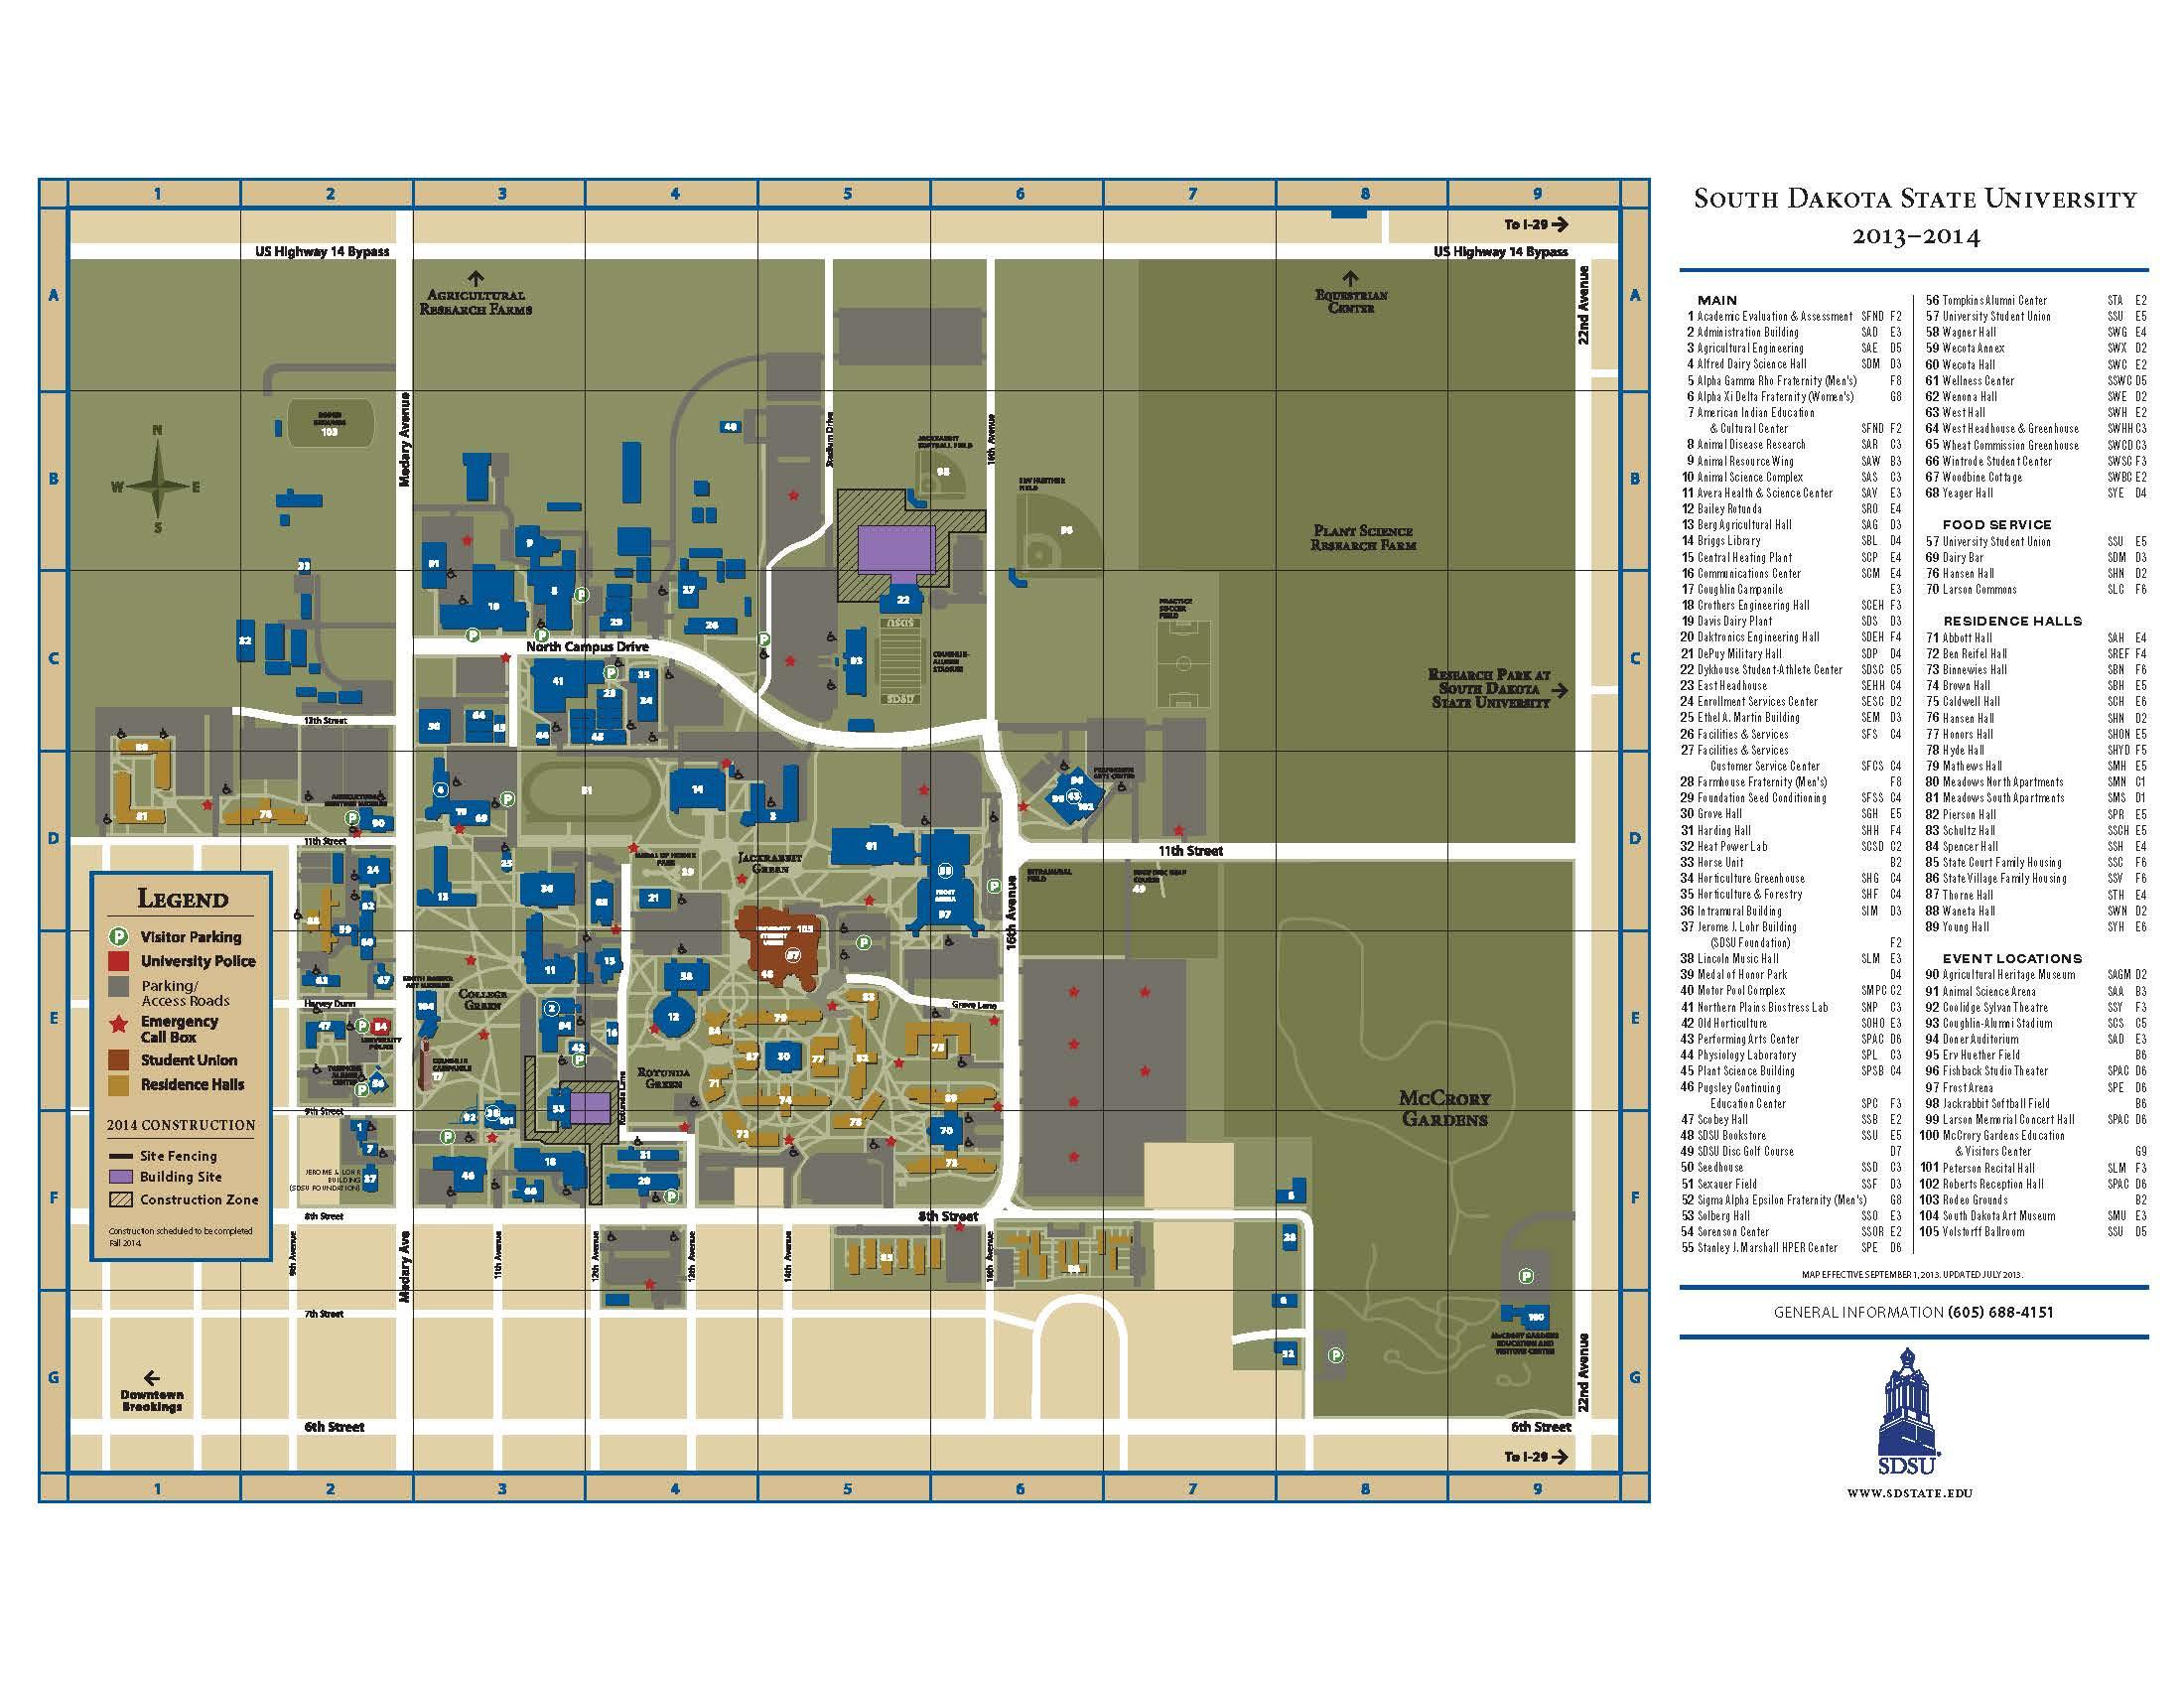 South Dakota State University Campus Map South Dakota State Campus Map | Time Zone Map